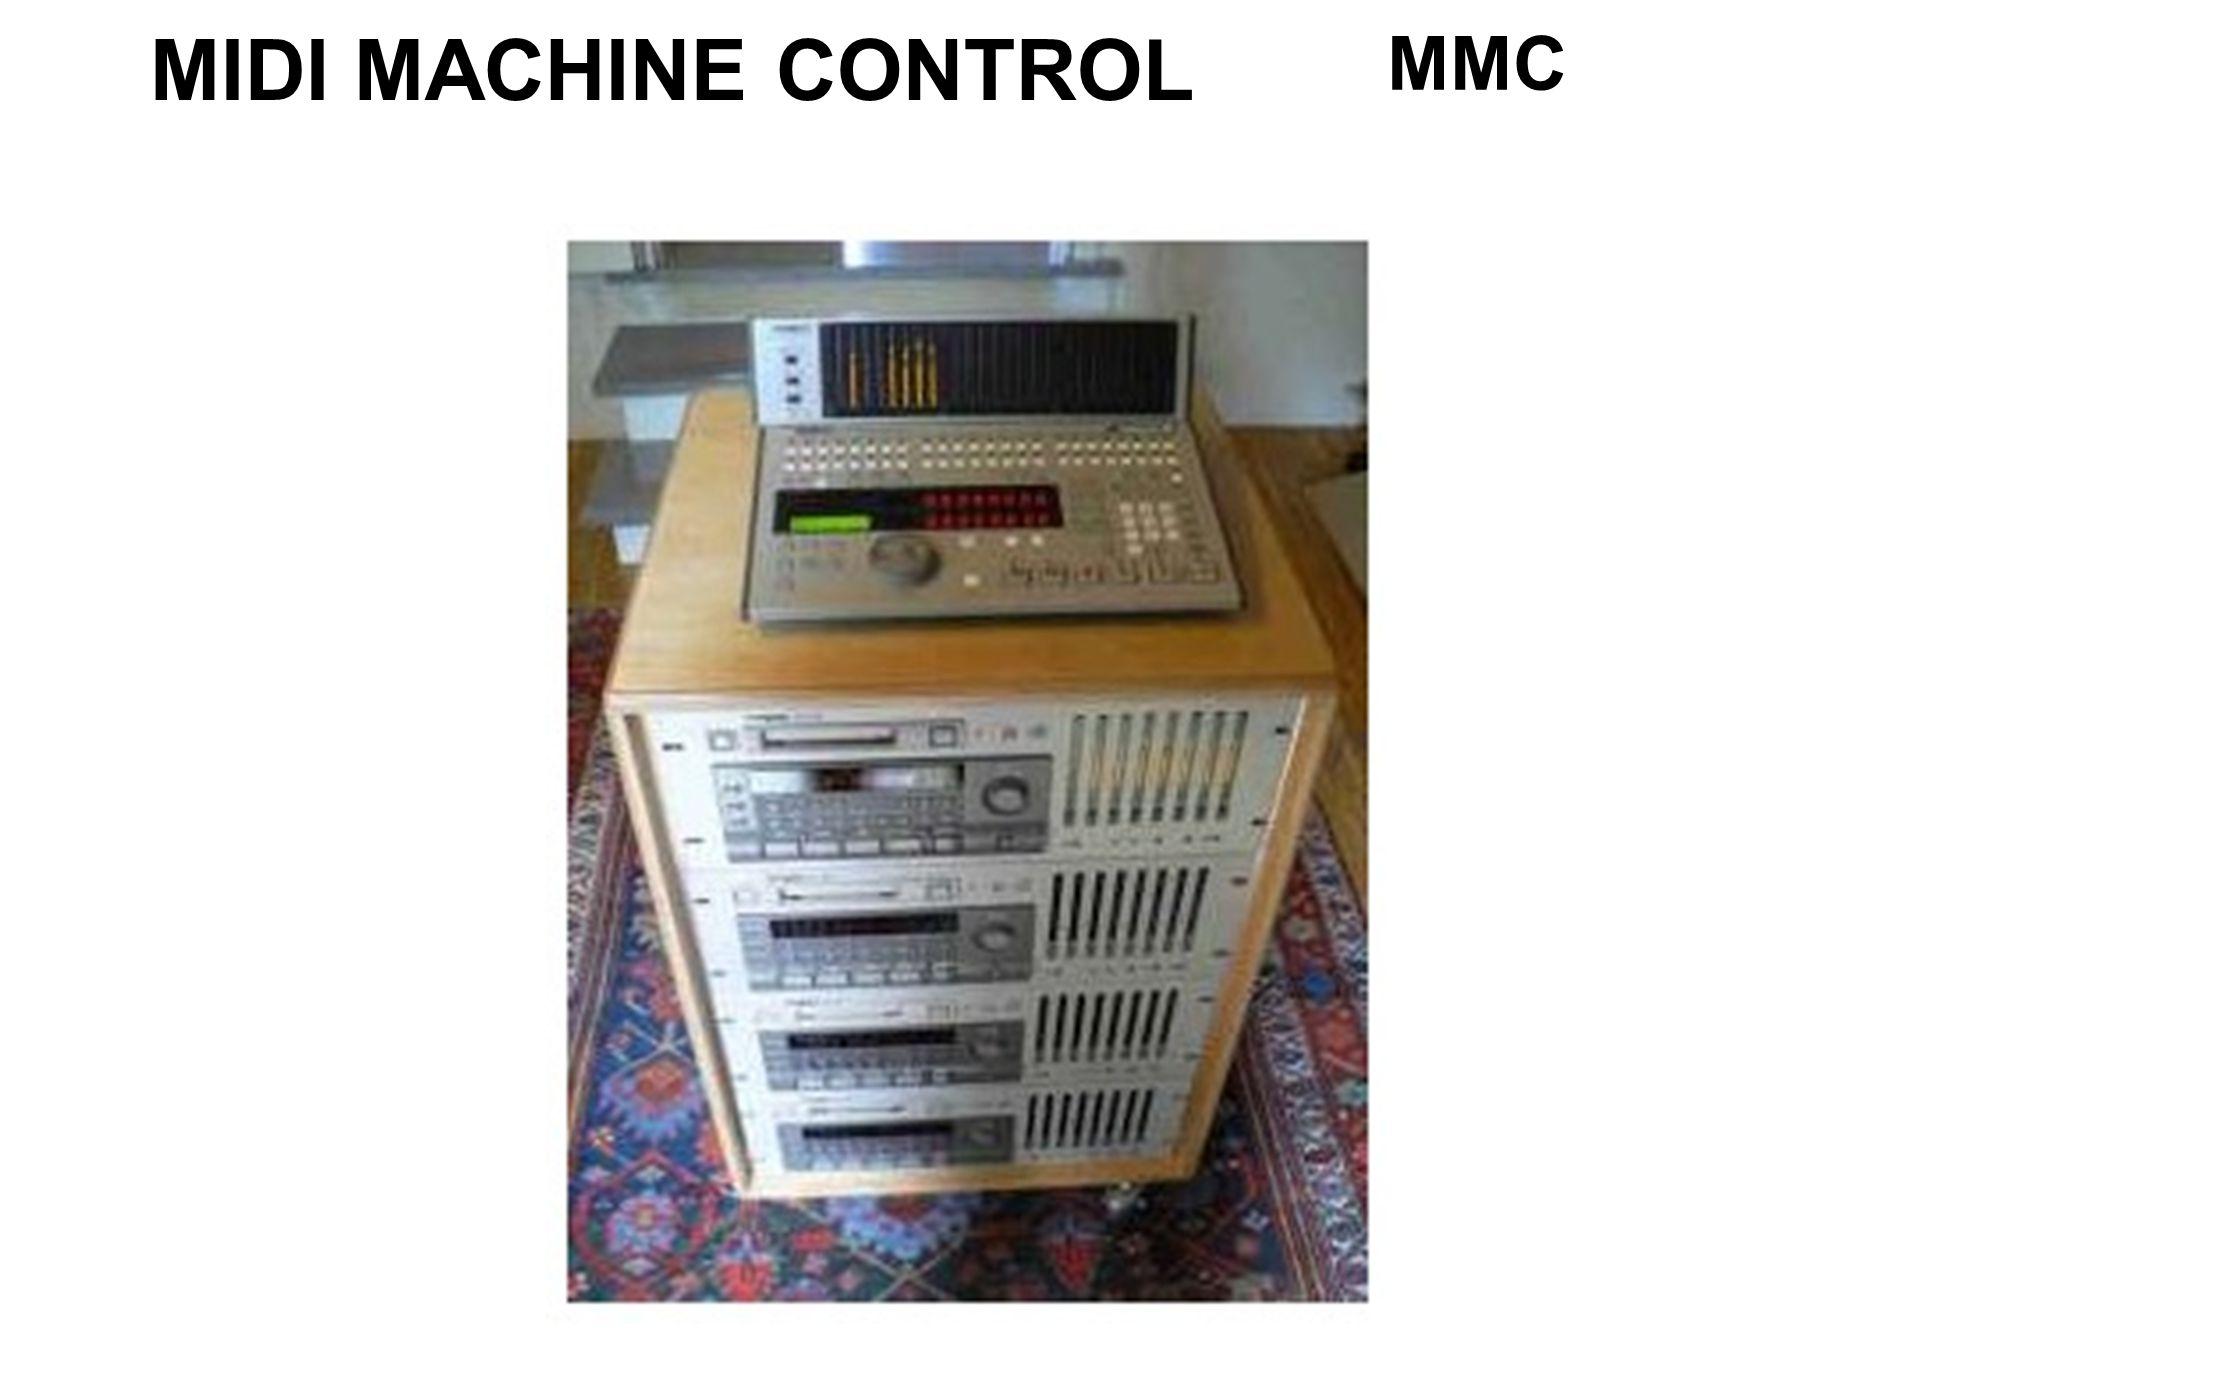 MIDI MACHINE CONTROL MMC A sequencer program can start, stop, fast forward, etc.